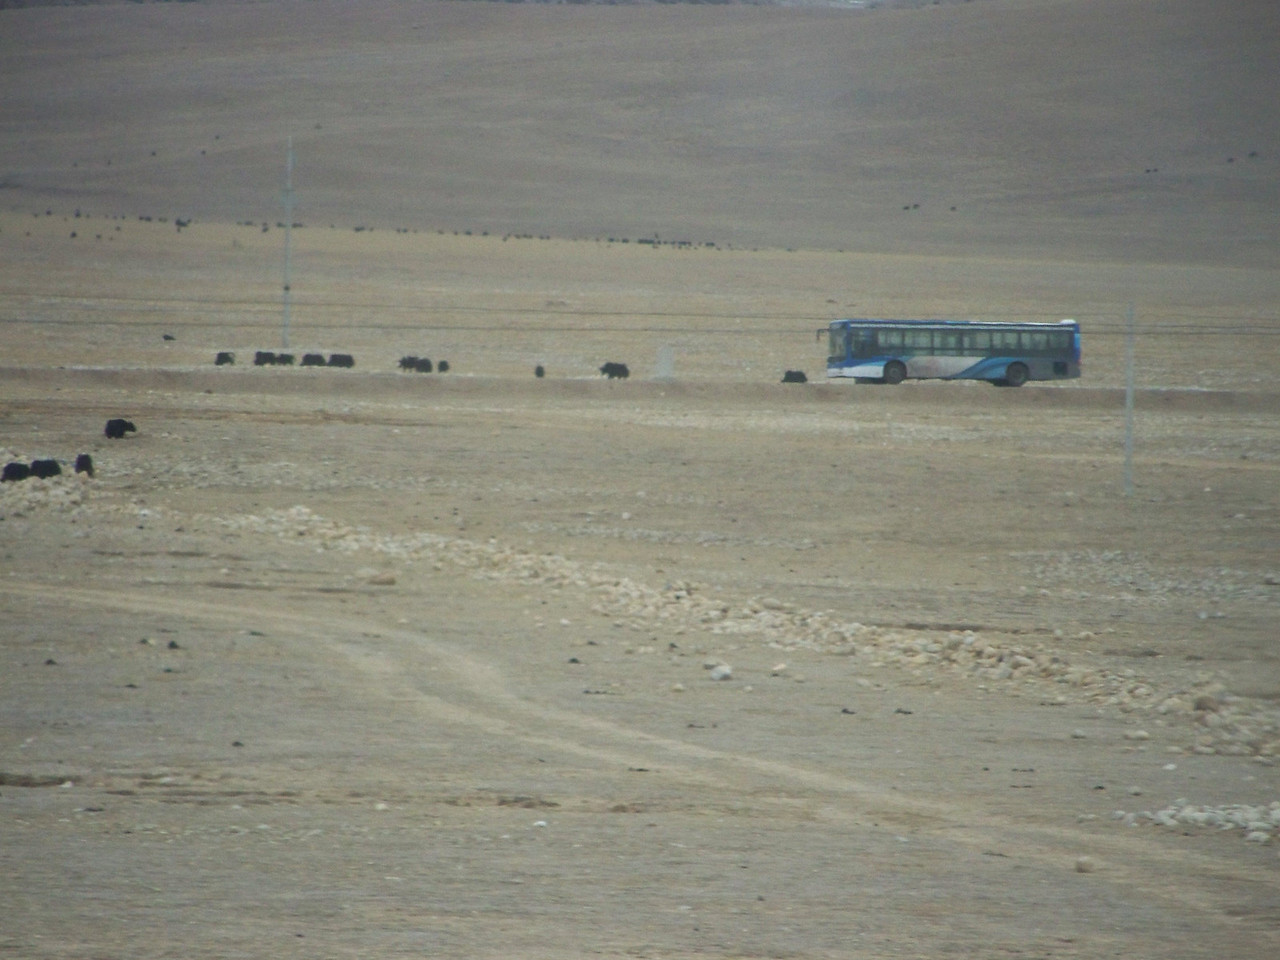 0119 - Yaks and Tibet Bus on Train Trip Between Beijing and Lhasa.JPG